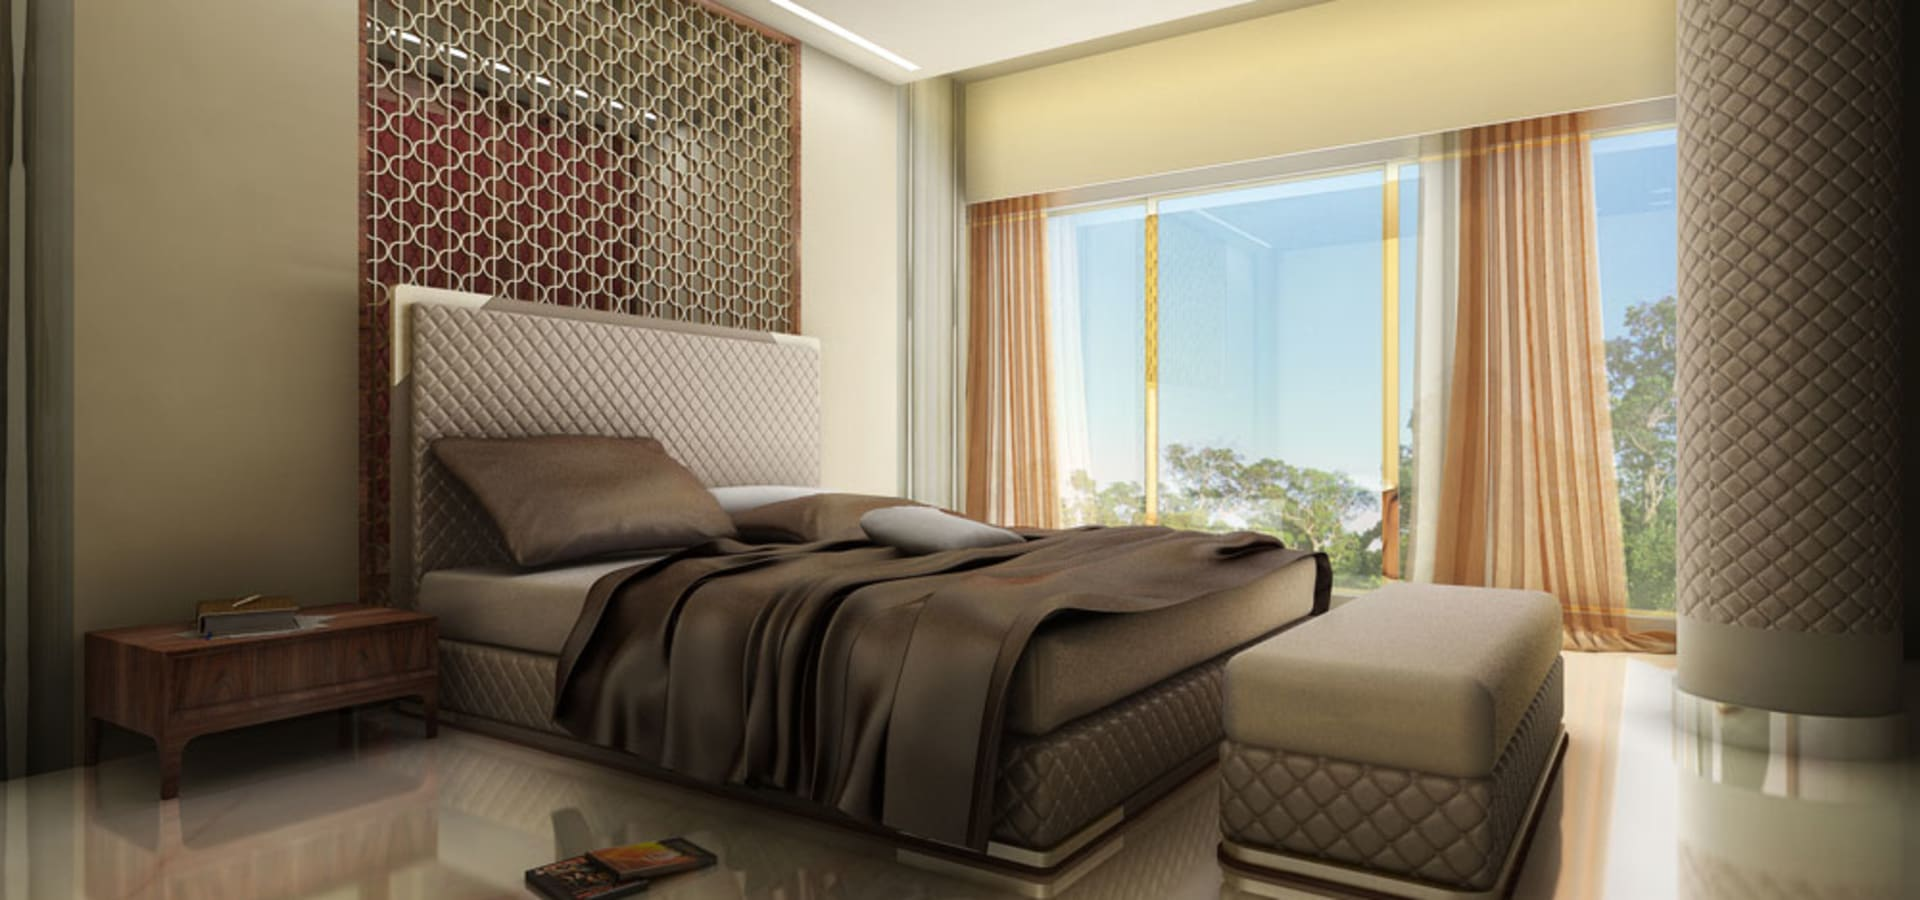 Spacious Designs Architects  Pvt. Ltd.